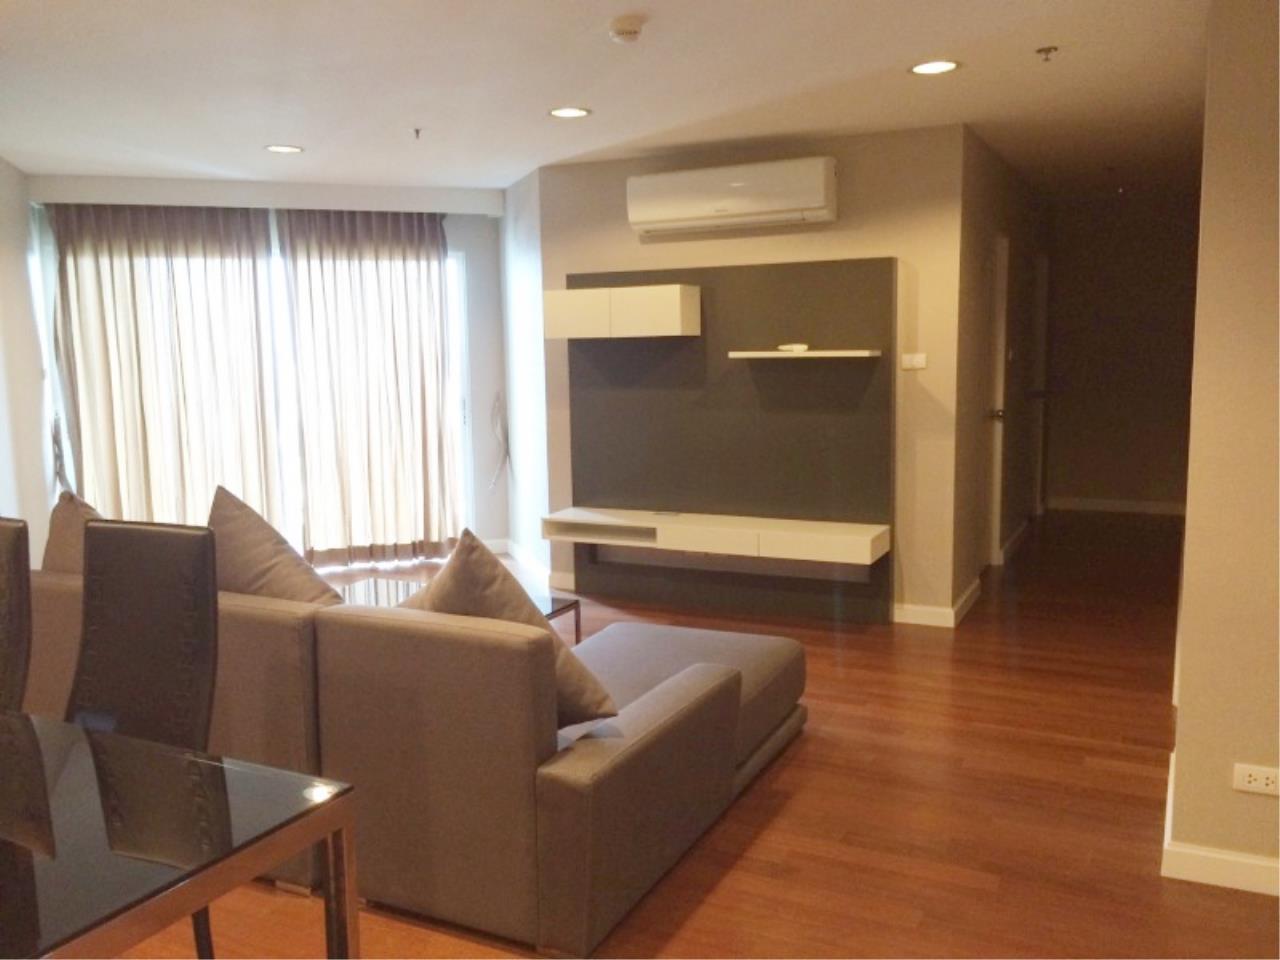 Century21 Skylux Agency's Belle Avenue Ratchada-Rama 9 / Condo For Sale / 3 Bedroom / 101.82 SQM / MRT Phra Ram 9 / Bangkok 2